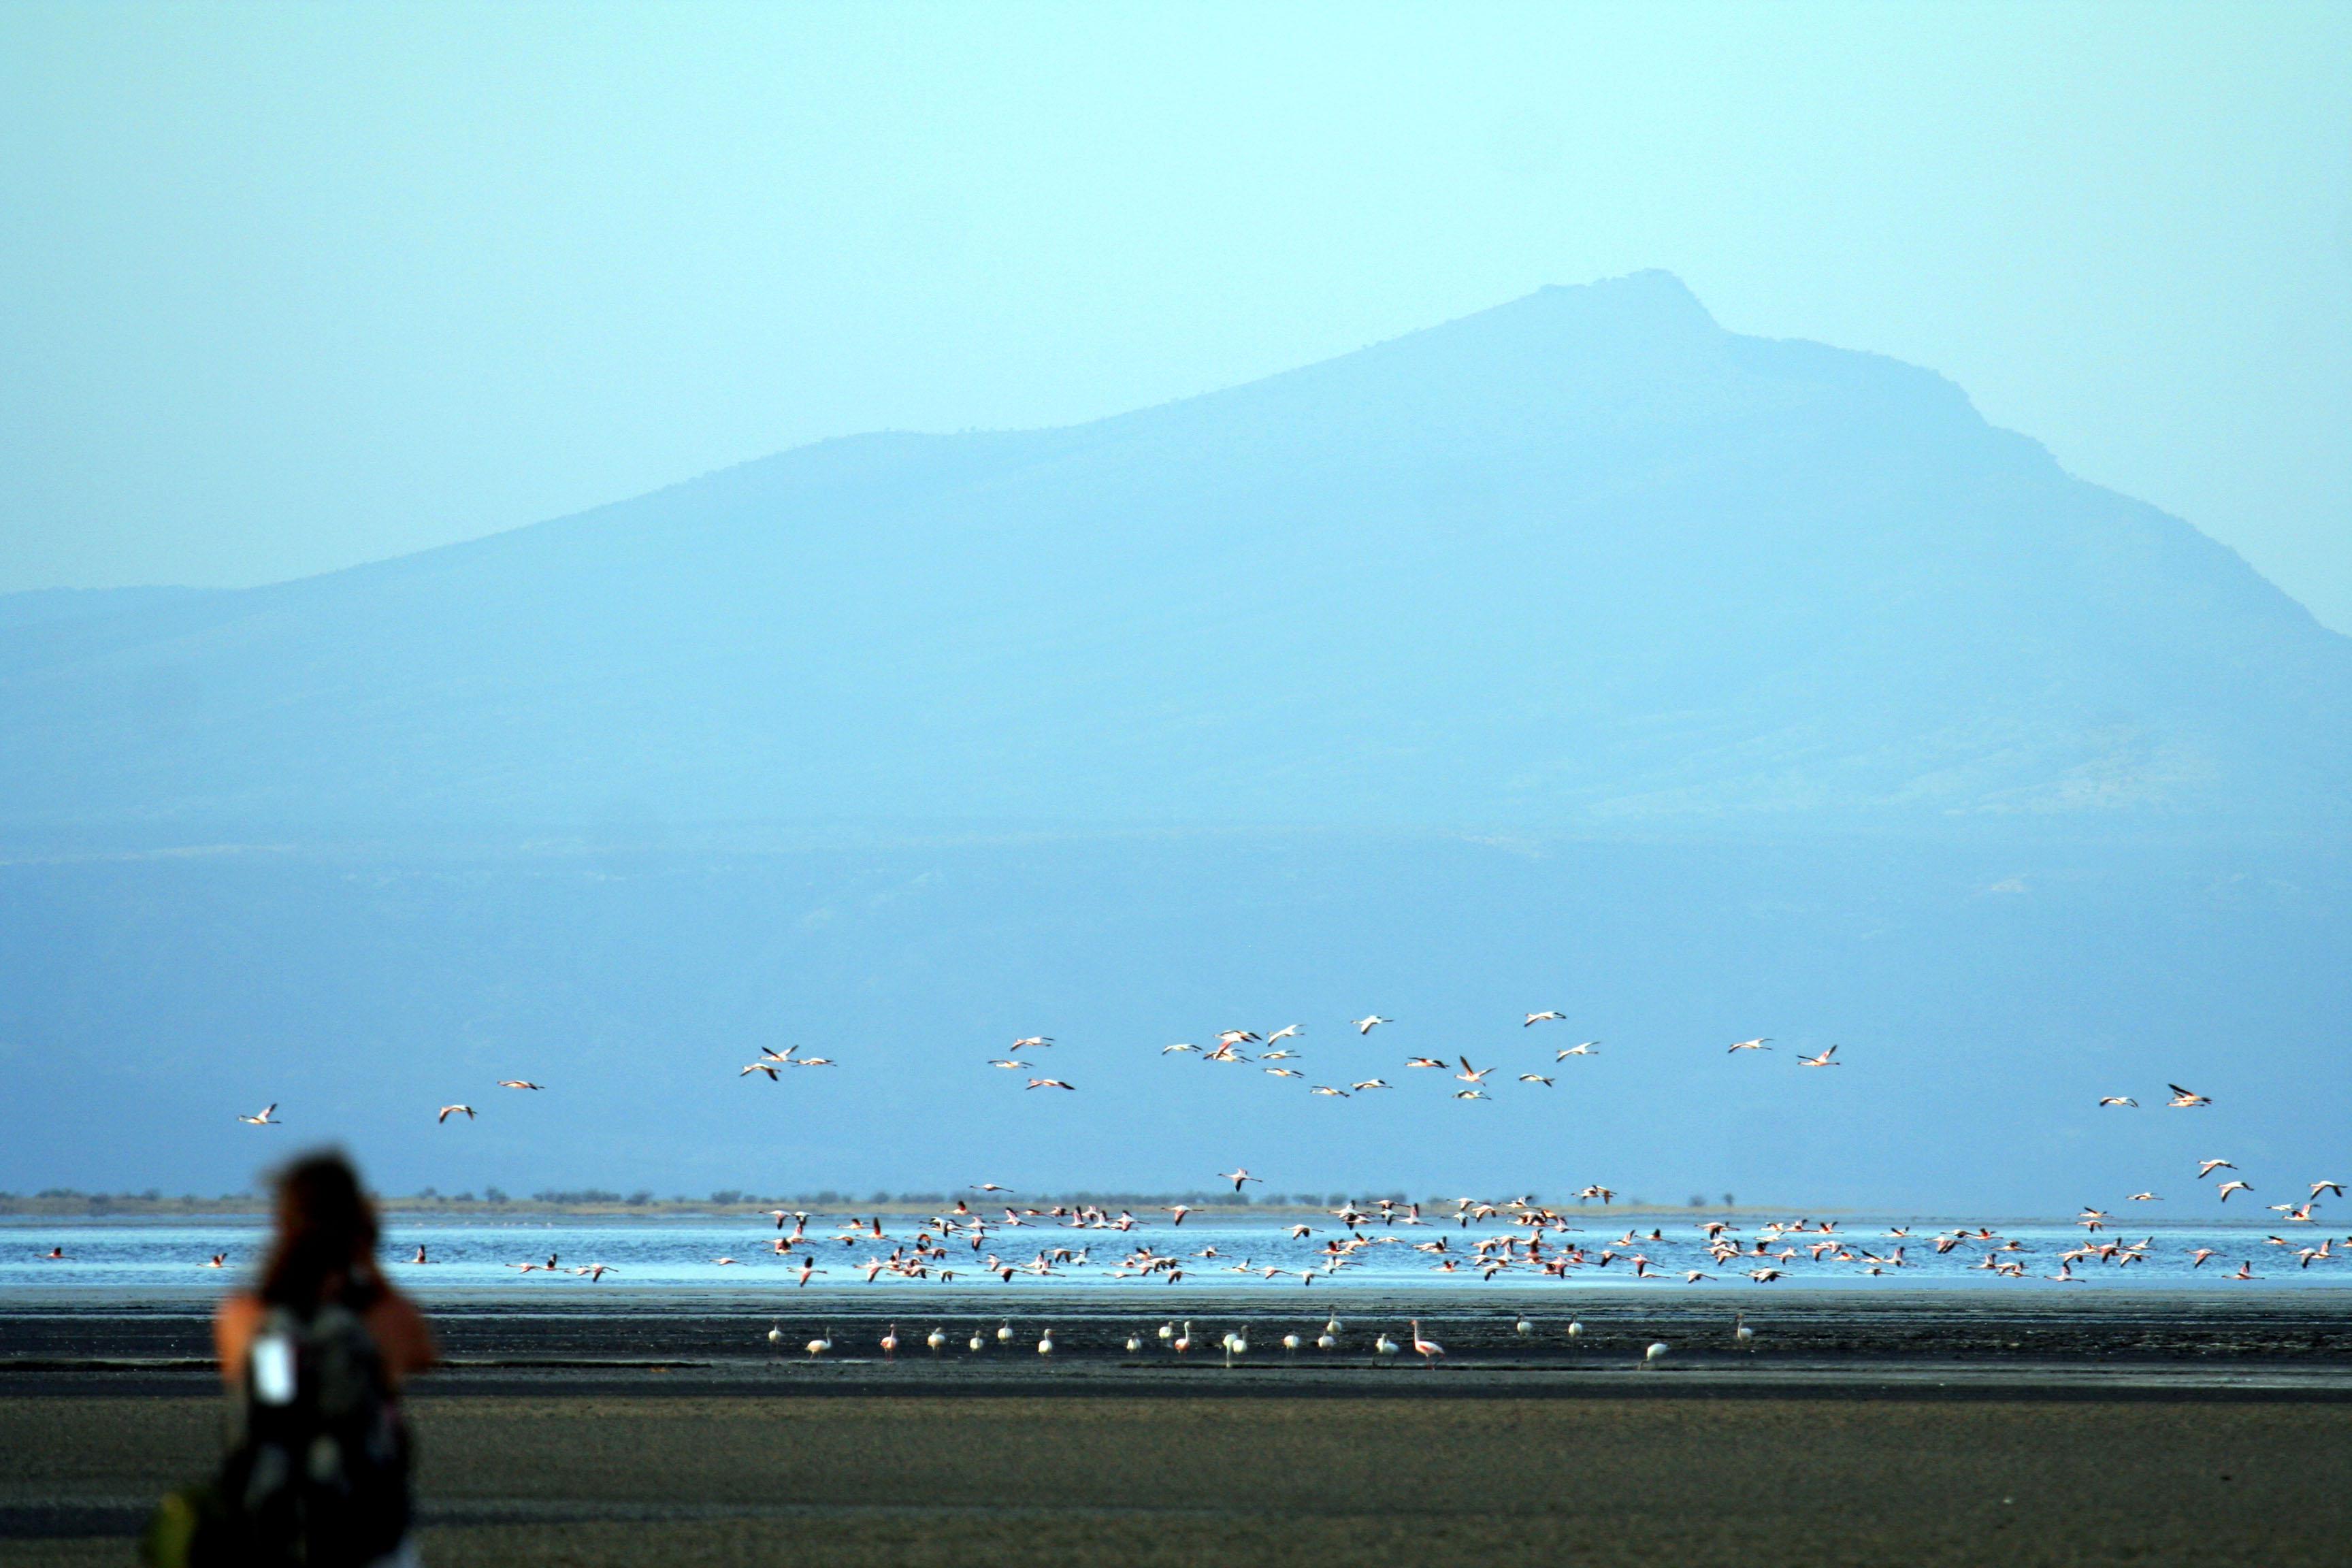 wp-content/uploads/itineraries/Safari/natron_lake_flamingo092506_3.jpg